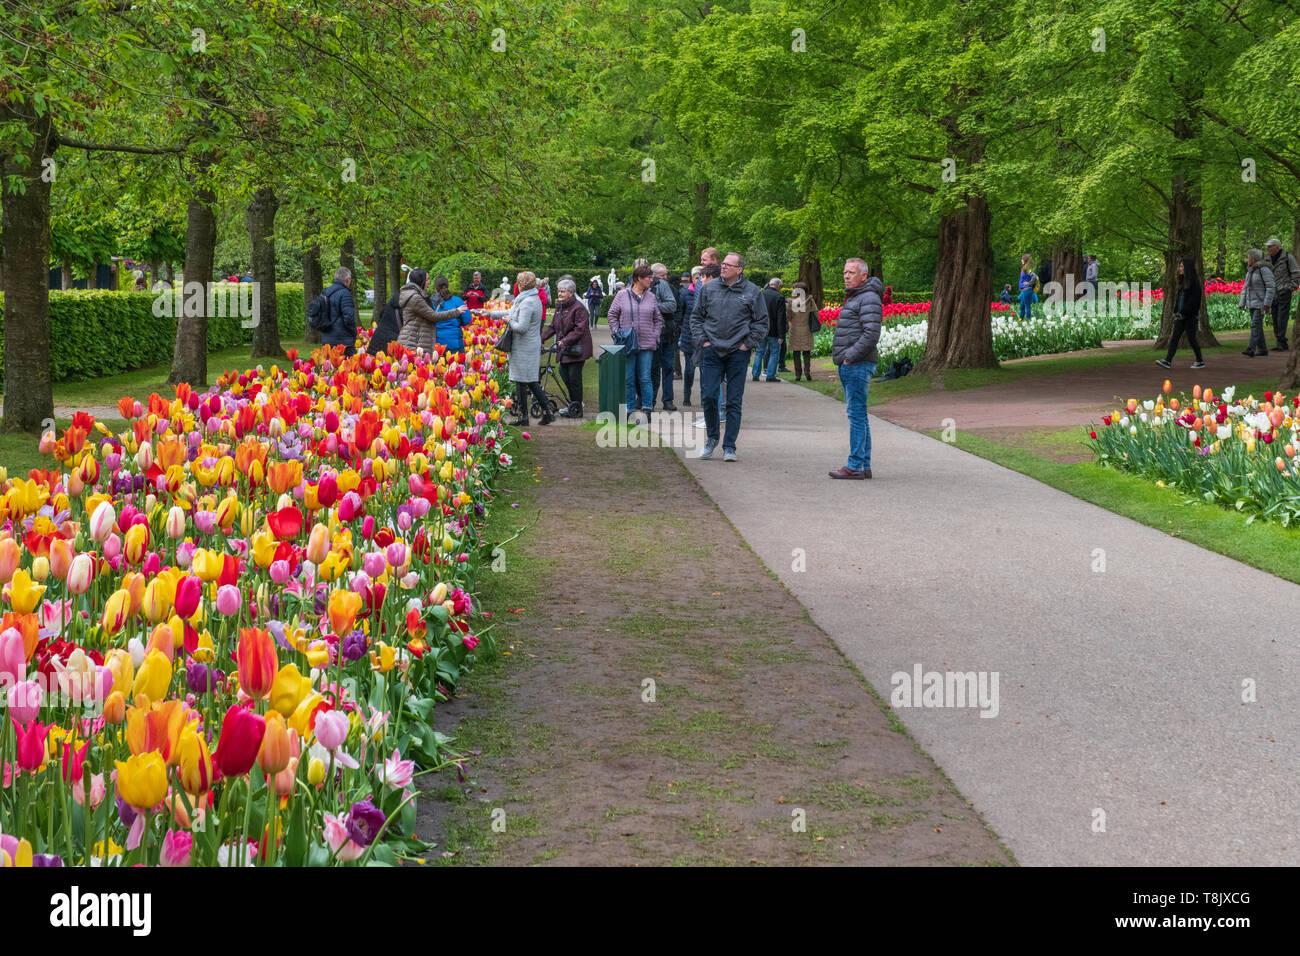 Keukenhof Gardens tourists - Lisse Netherlands - tourism tulips - multi-colored tulip flower beds - tulip flowers - Stock Image